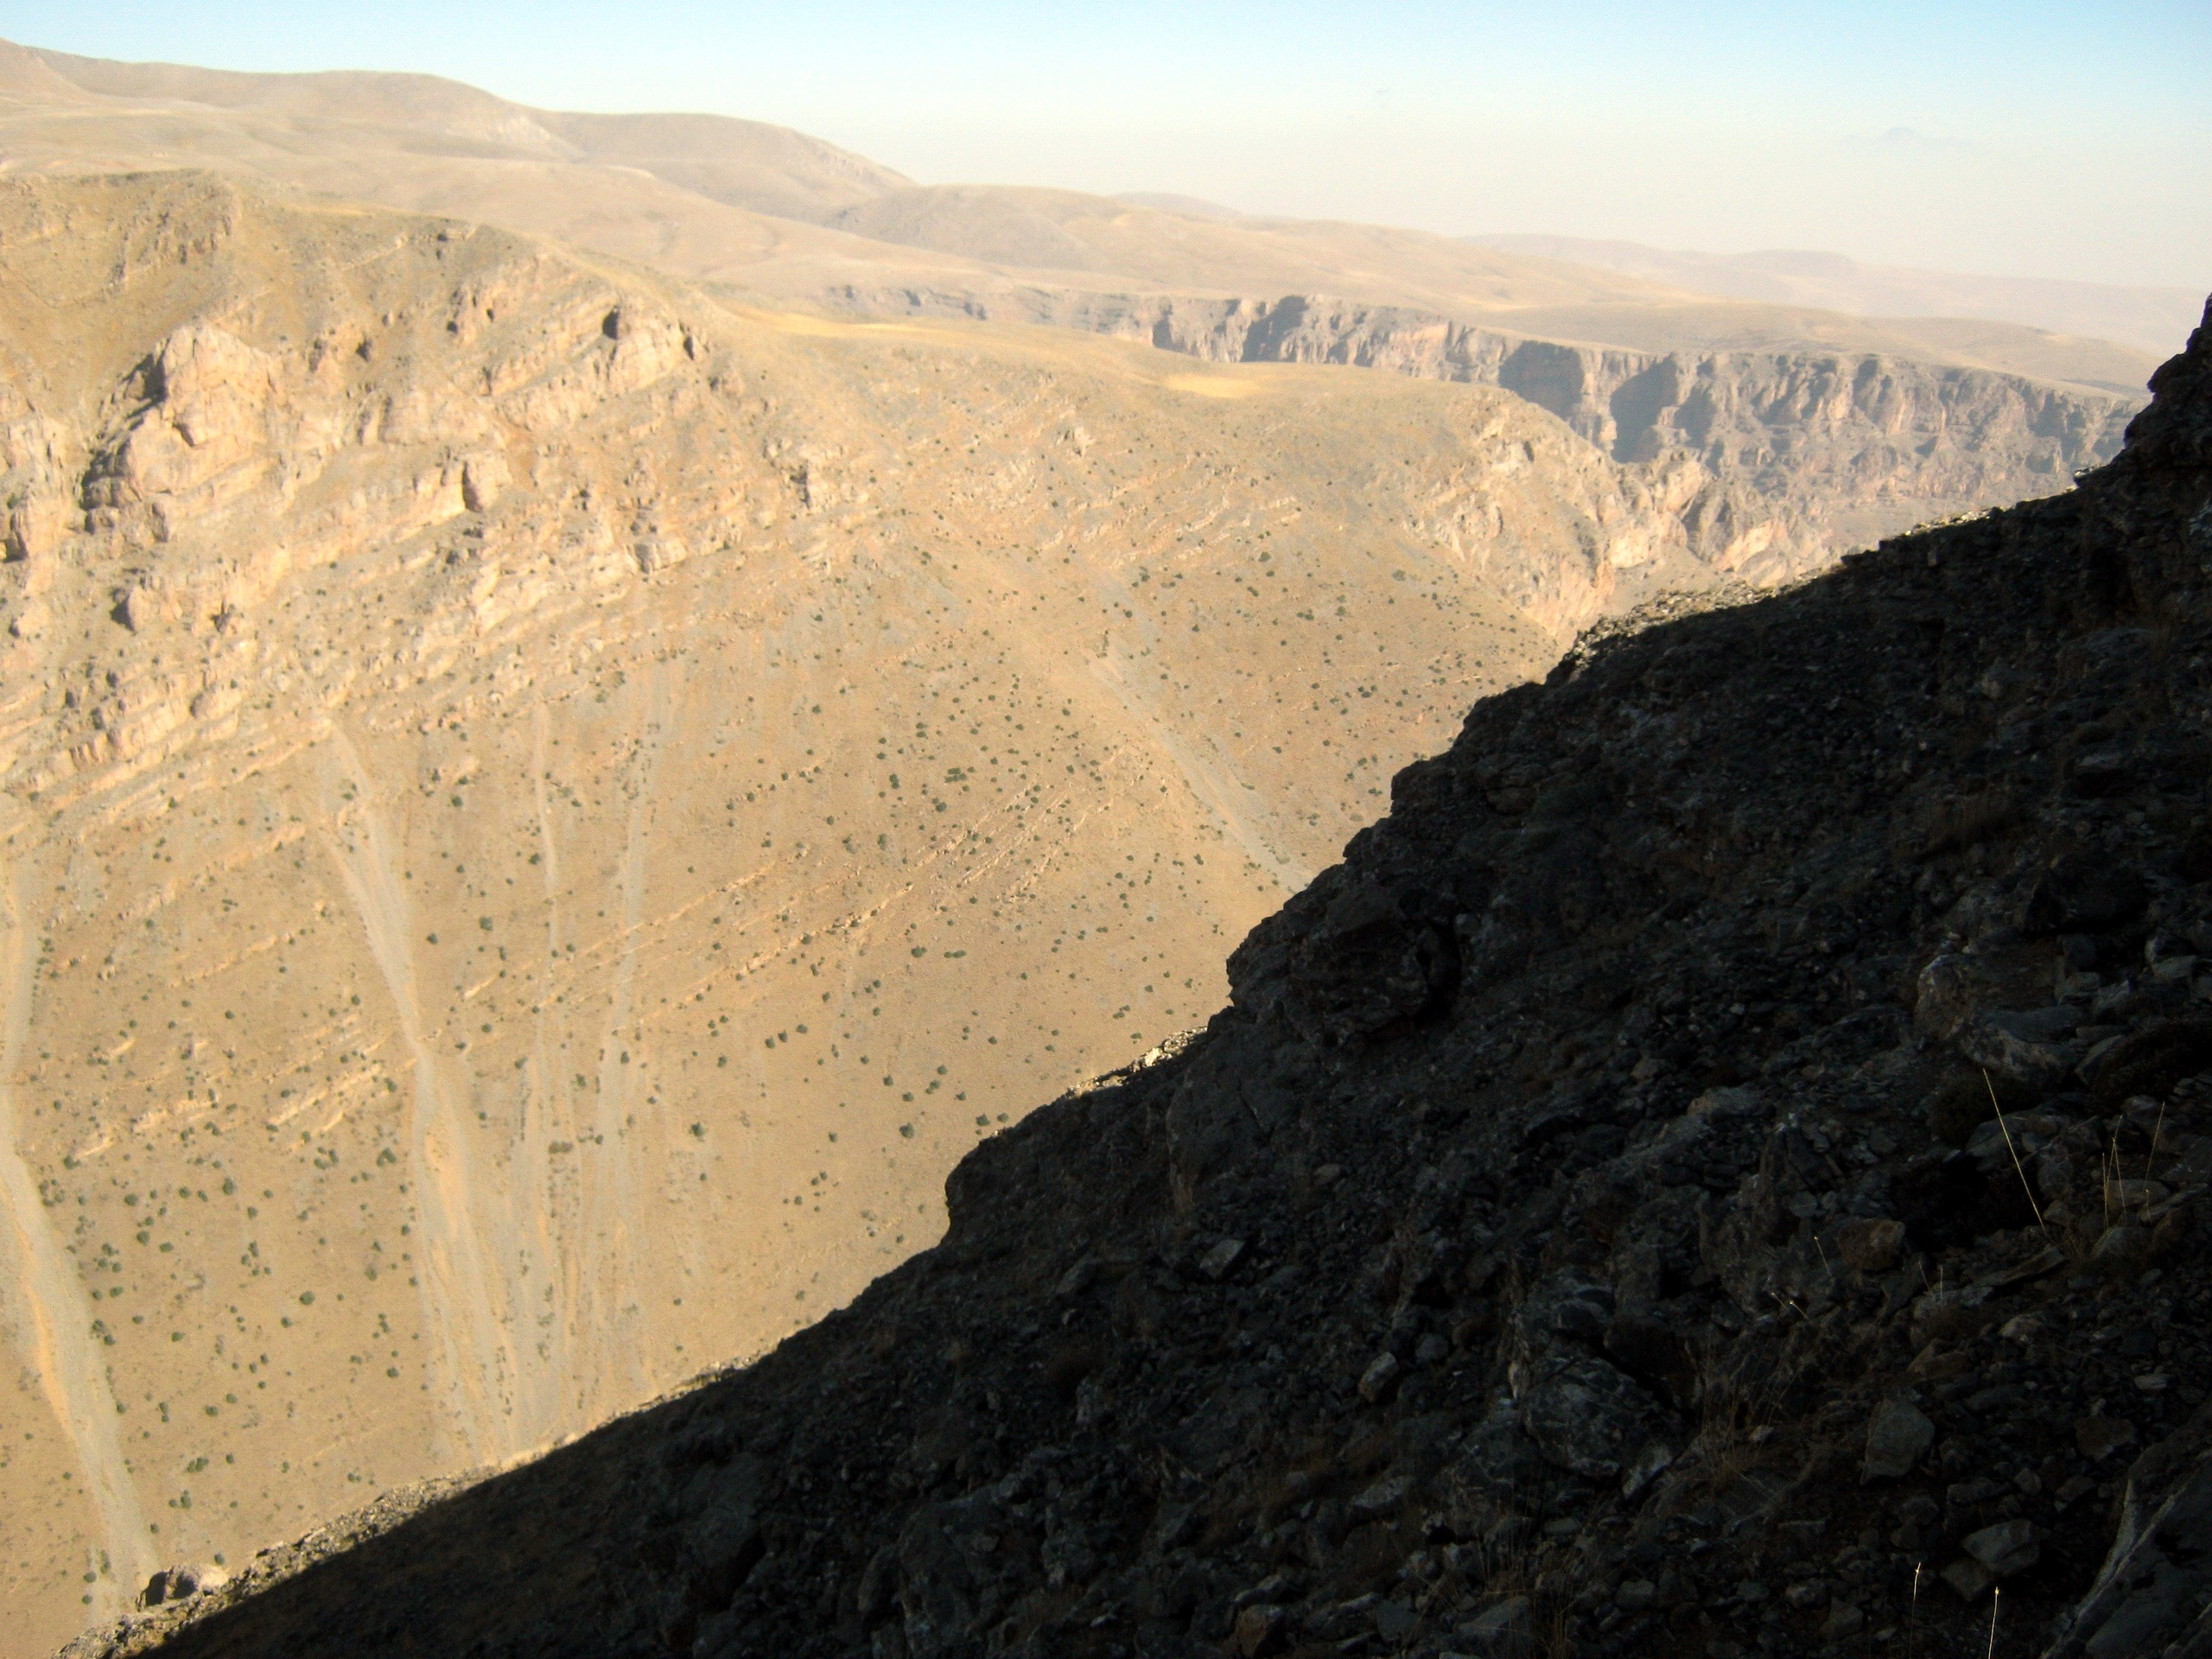 север Аладаглар